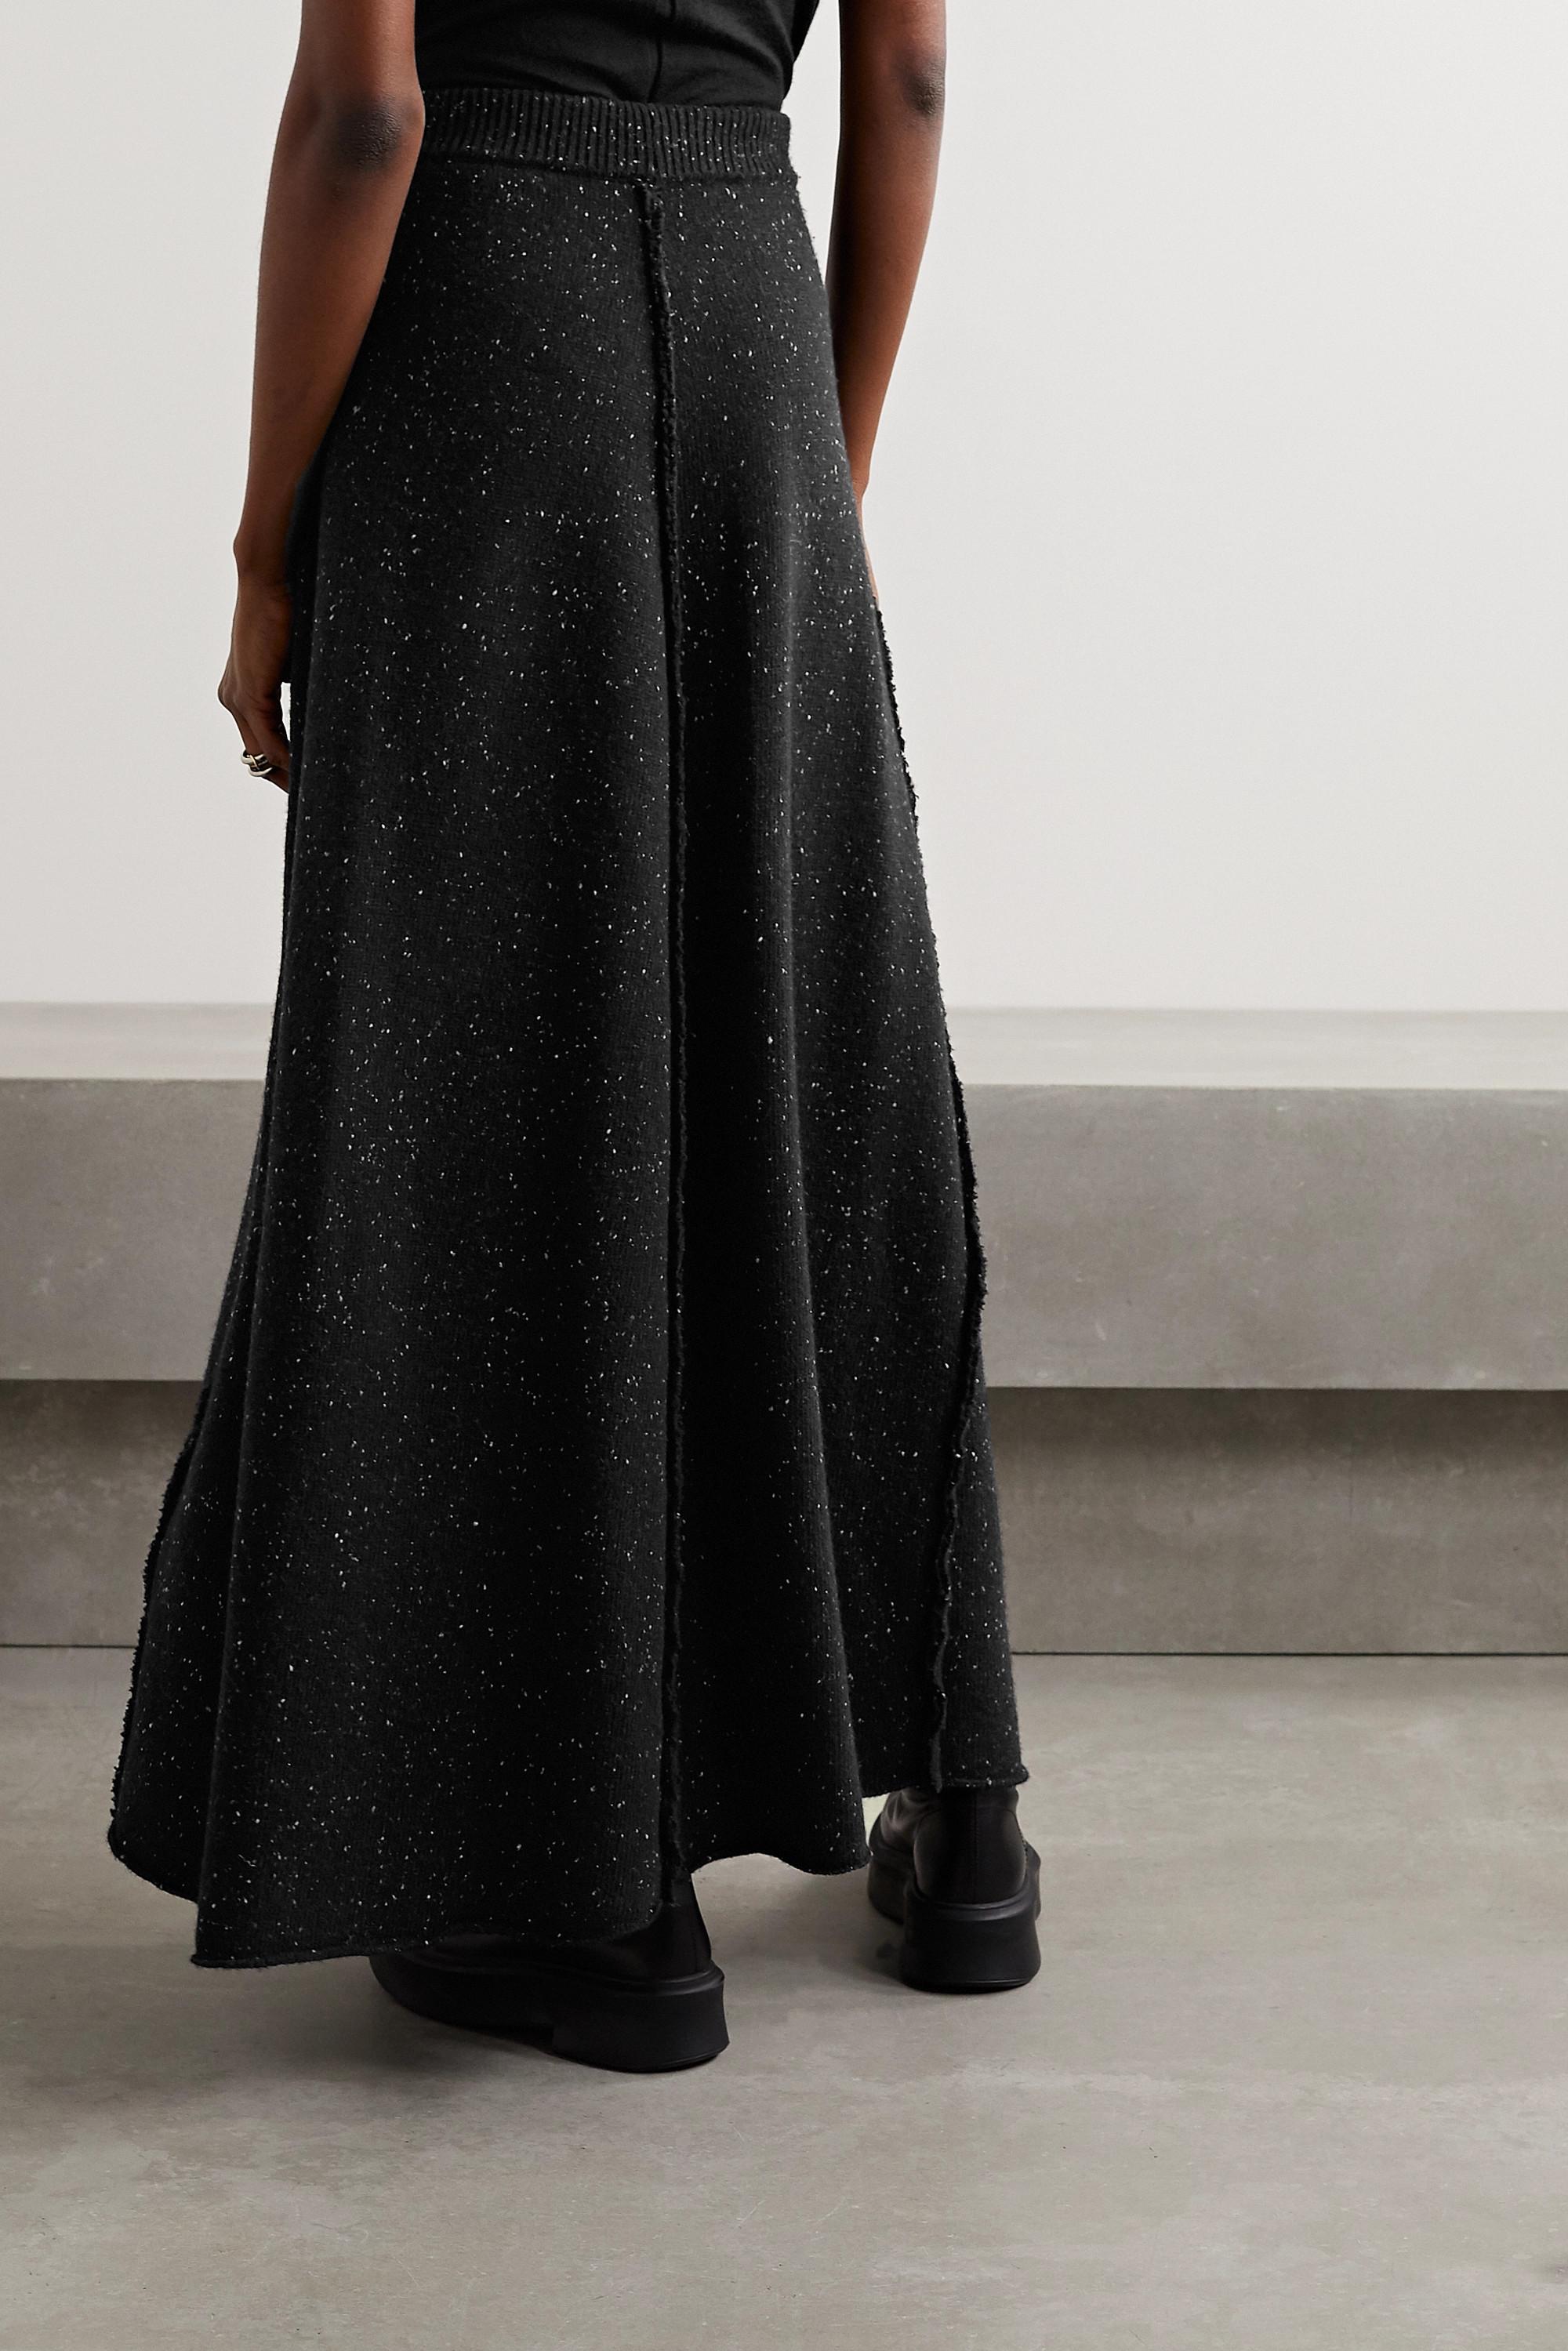 The Row Arlette mélange wool maxi skirt